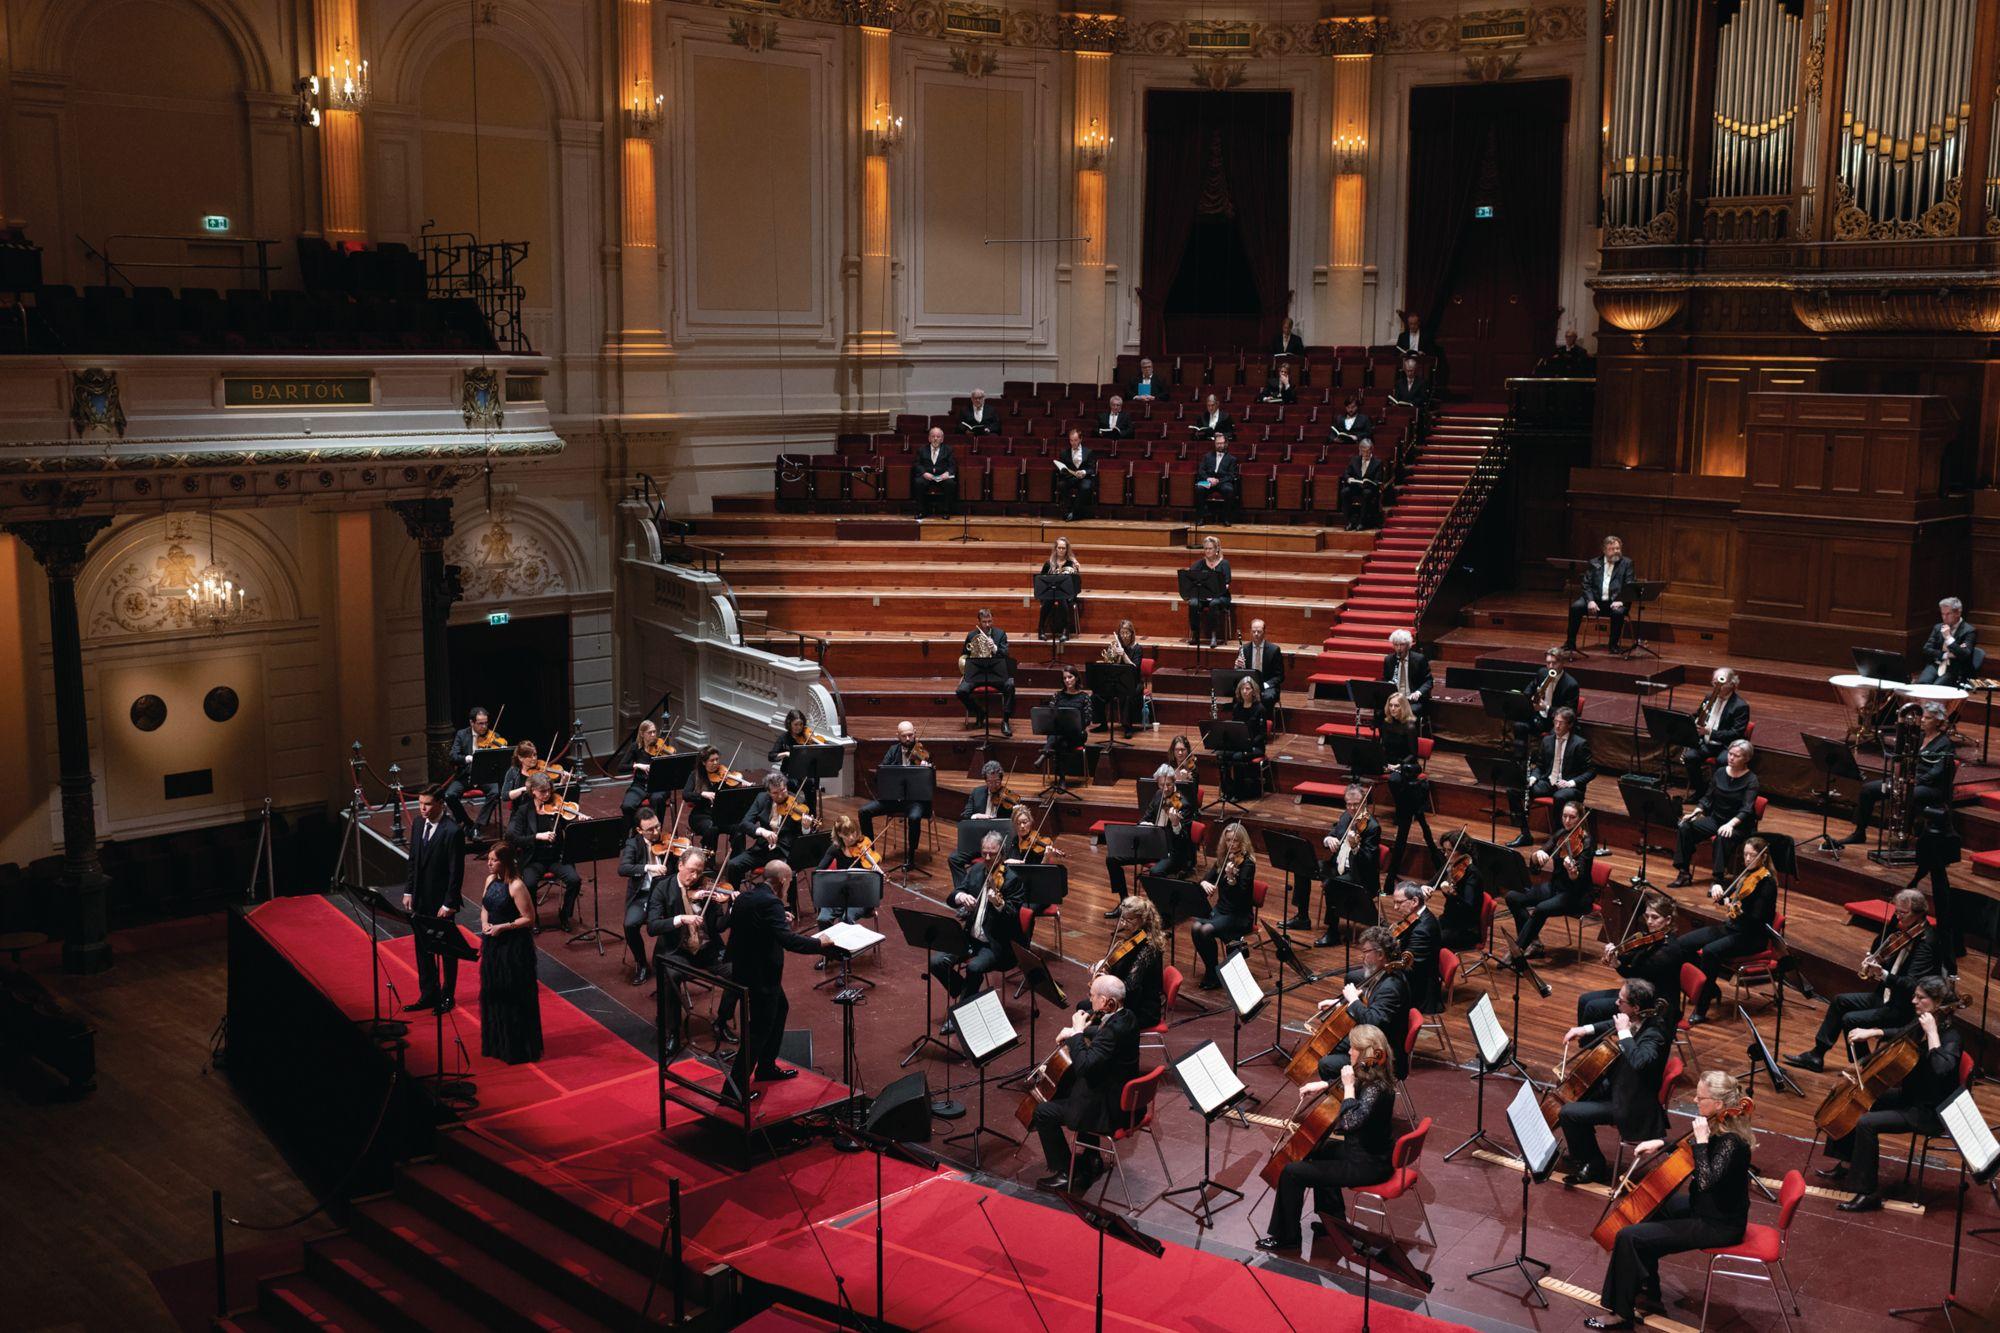 The Netherlands Radio Philharmonic Orchestra and Van Zweden (Photo: Simon Van Boxtel/The Netherlands Radio Philharmonic Orchestra)